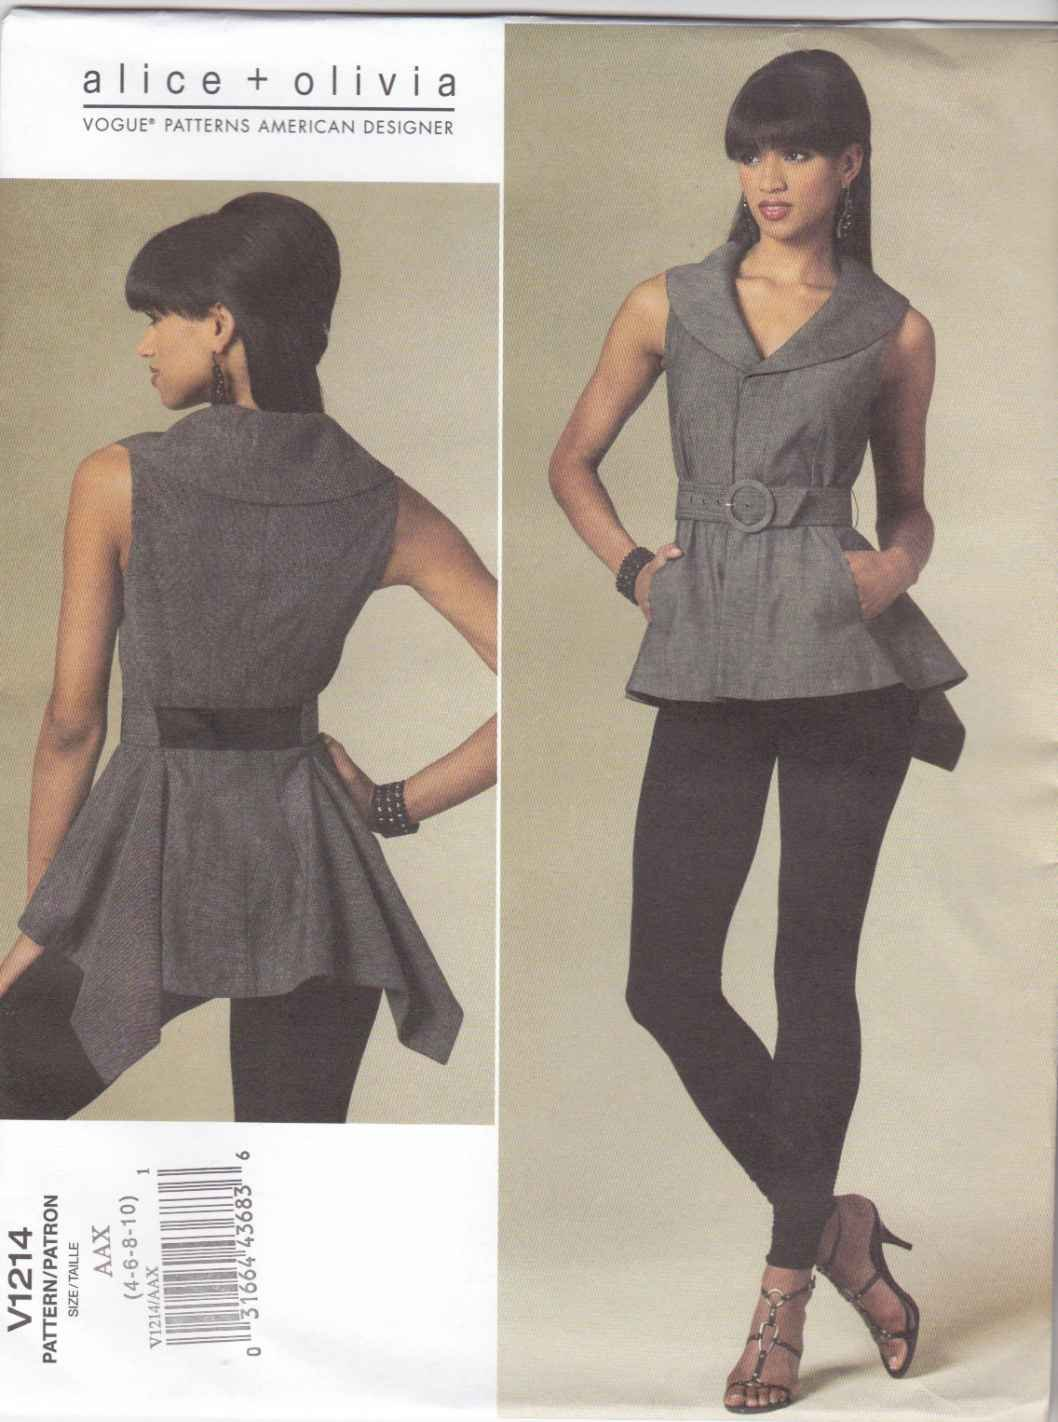 Vogue Sewing Pattern 1214 V1214 Misses Size 12-18 Alice & Olivia Sleeveless Top Belt Knit Leggings